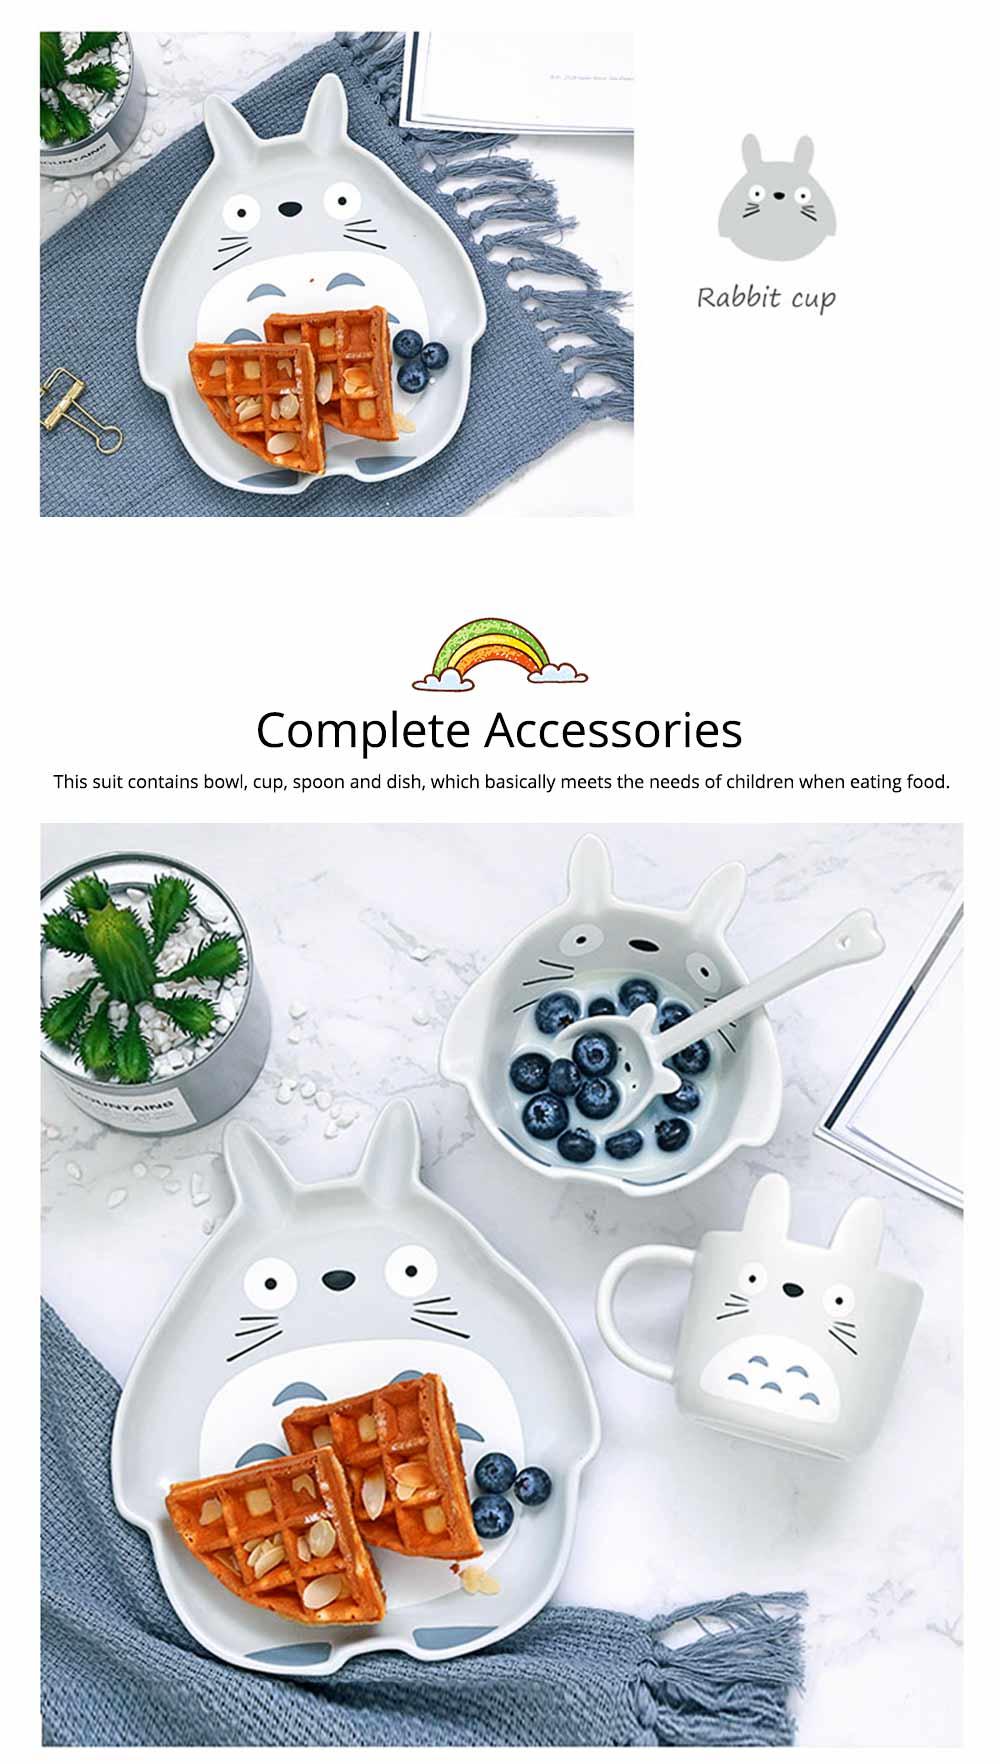 Cute Creative Carton Animal Model Ceramics 4PCS Tableware Suit, Functional Fancy Bowl Cup Spoon Dish Set for Children 3